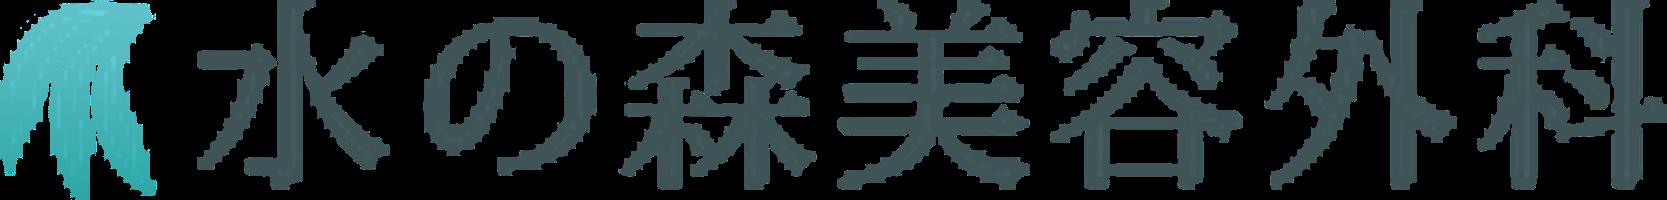 水の森美容外科 北海道院ロゴ